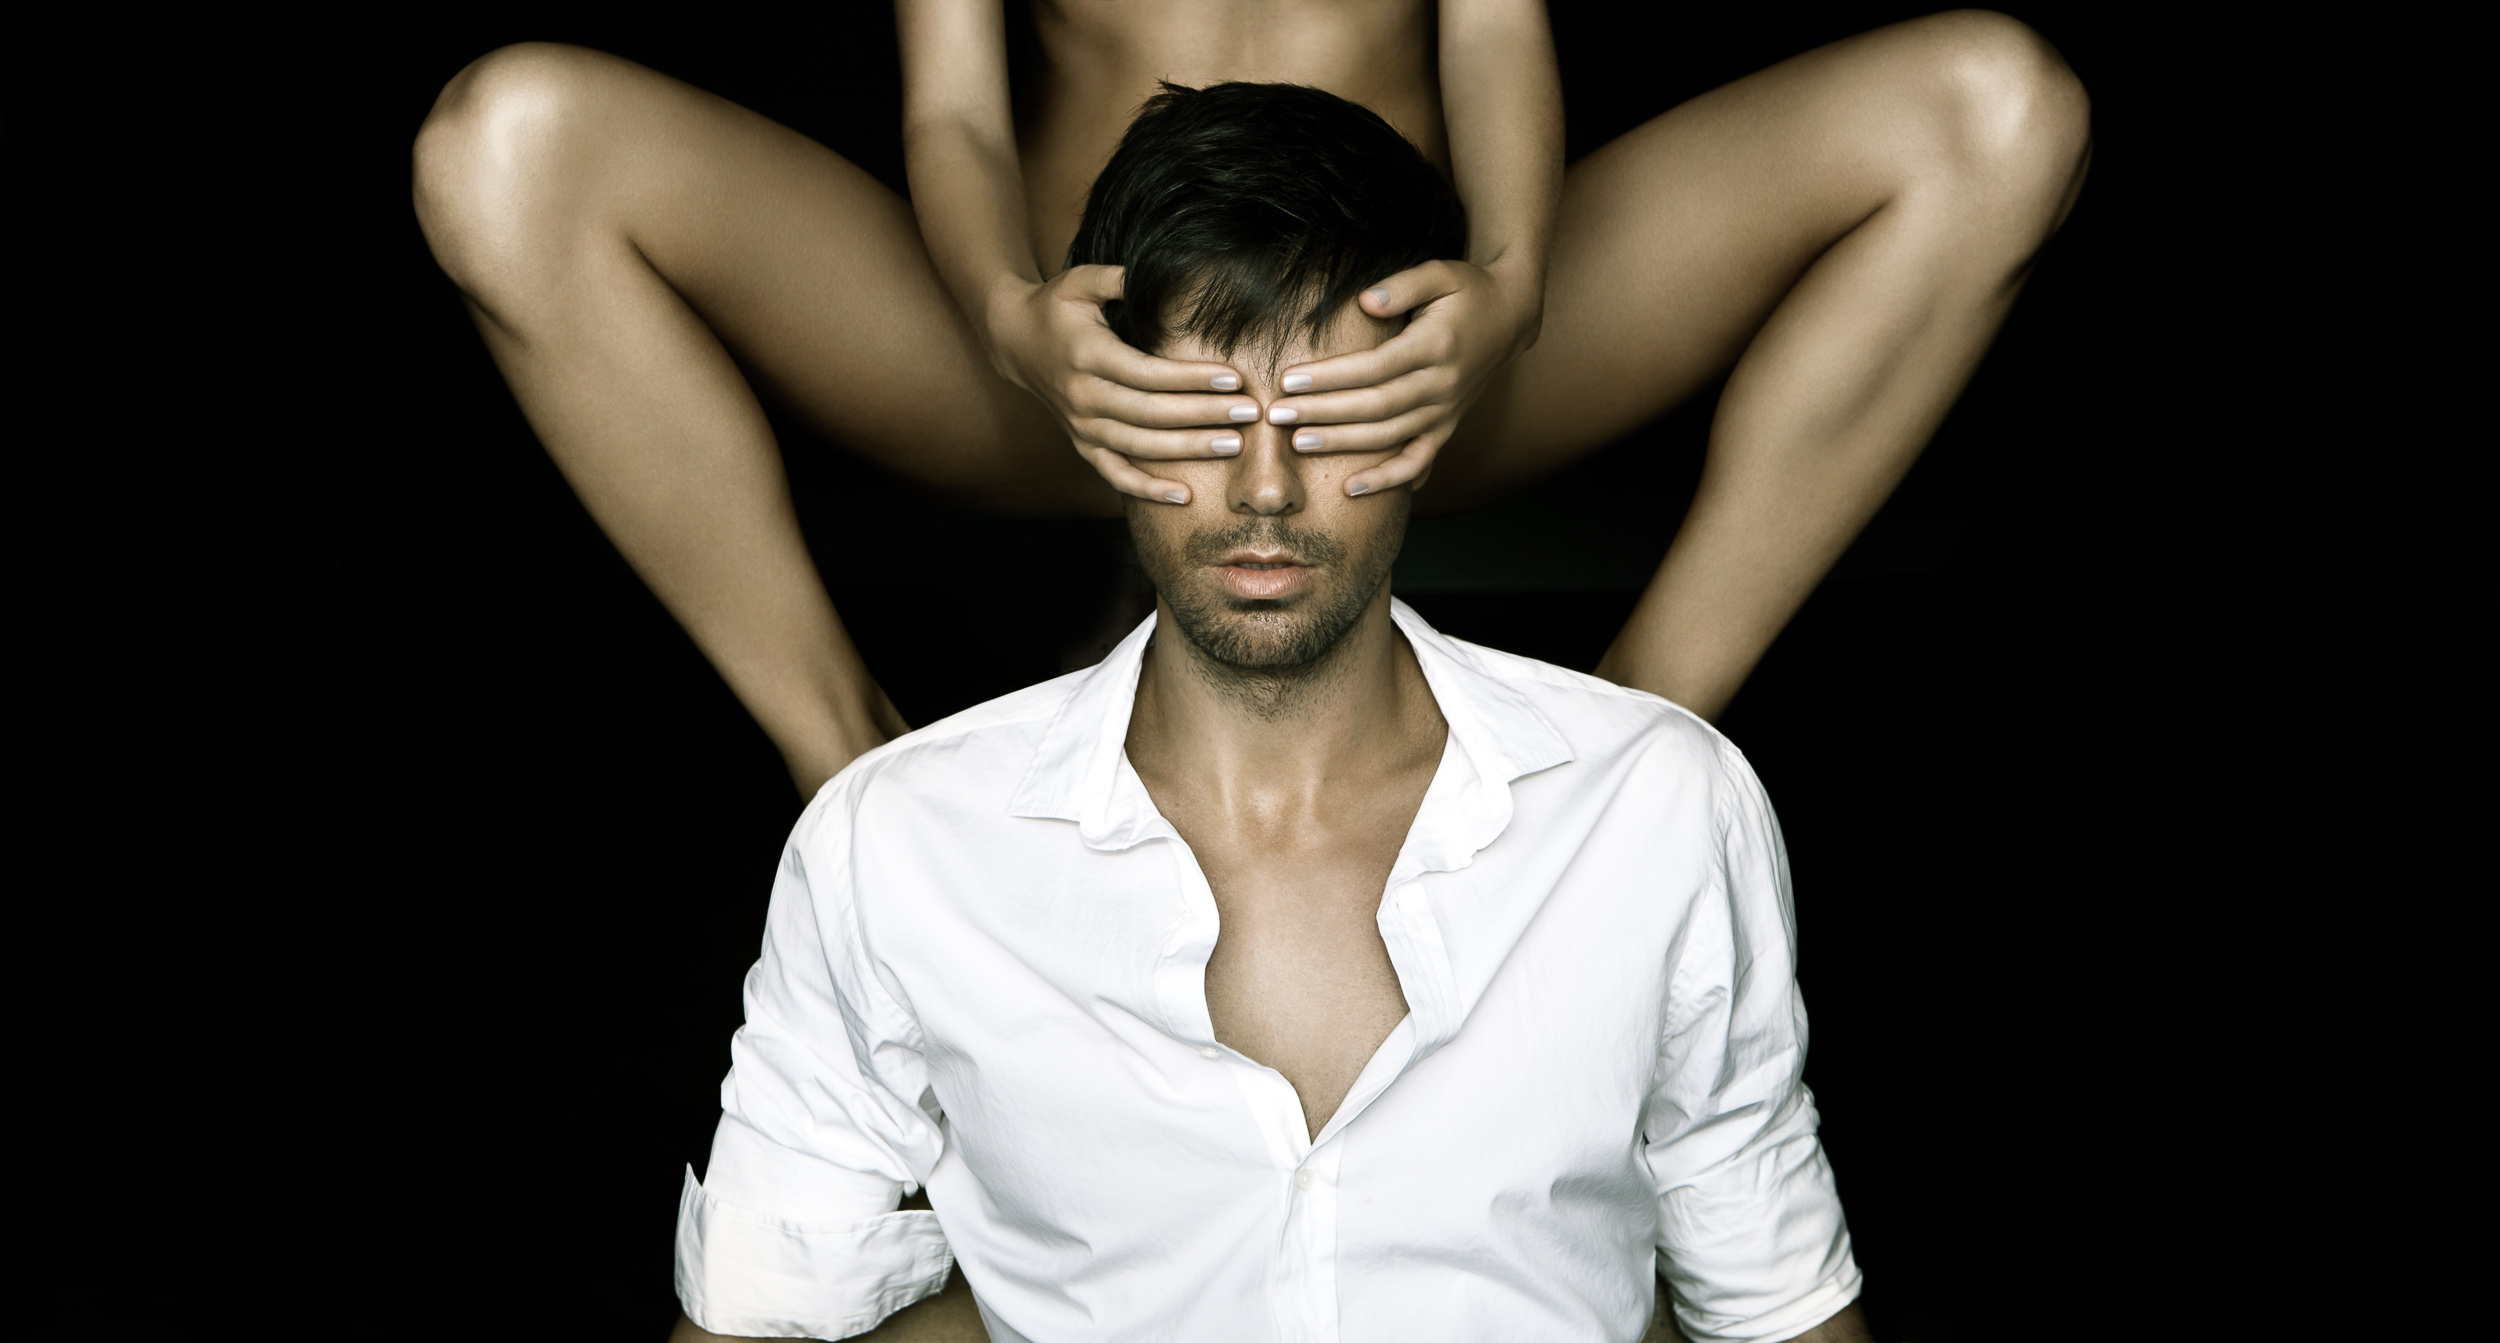 Enrique_Iglesias-Chapman_Baehler14.jpg